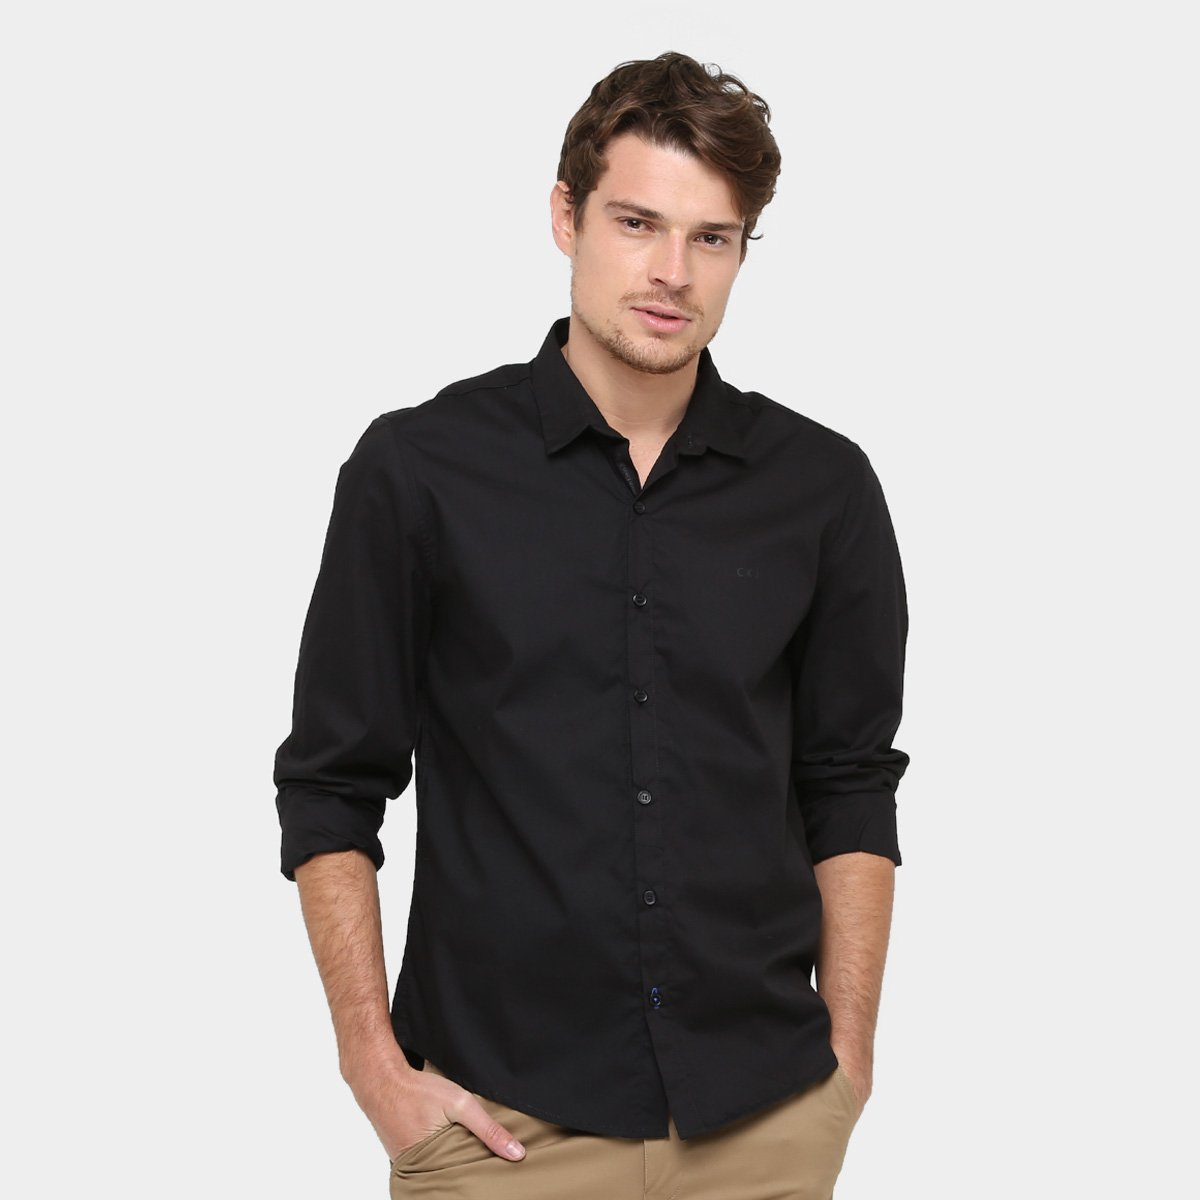 b475f41dc260f Camisa Social Calvin Klein Slim Fit Manga Longa Masculina - Compre ...